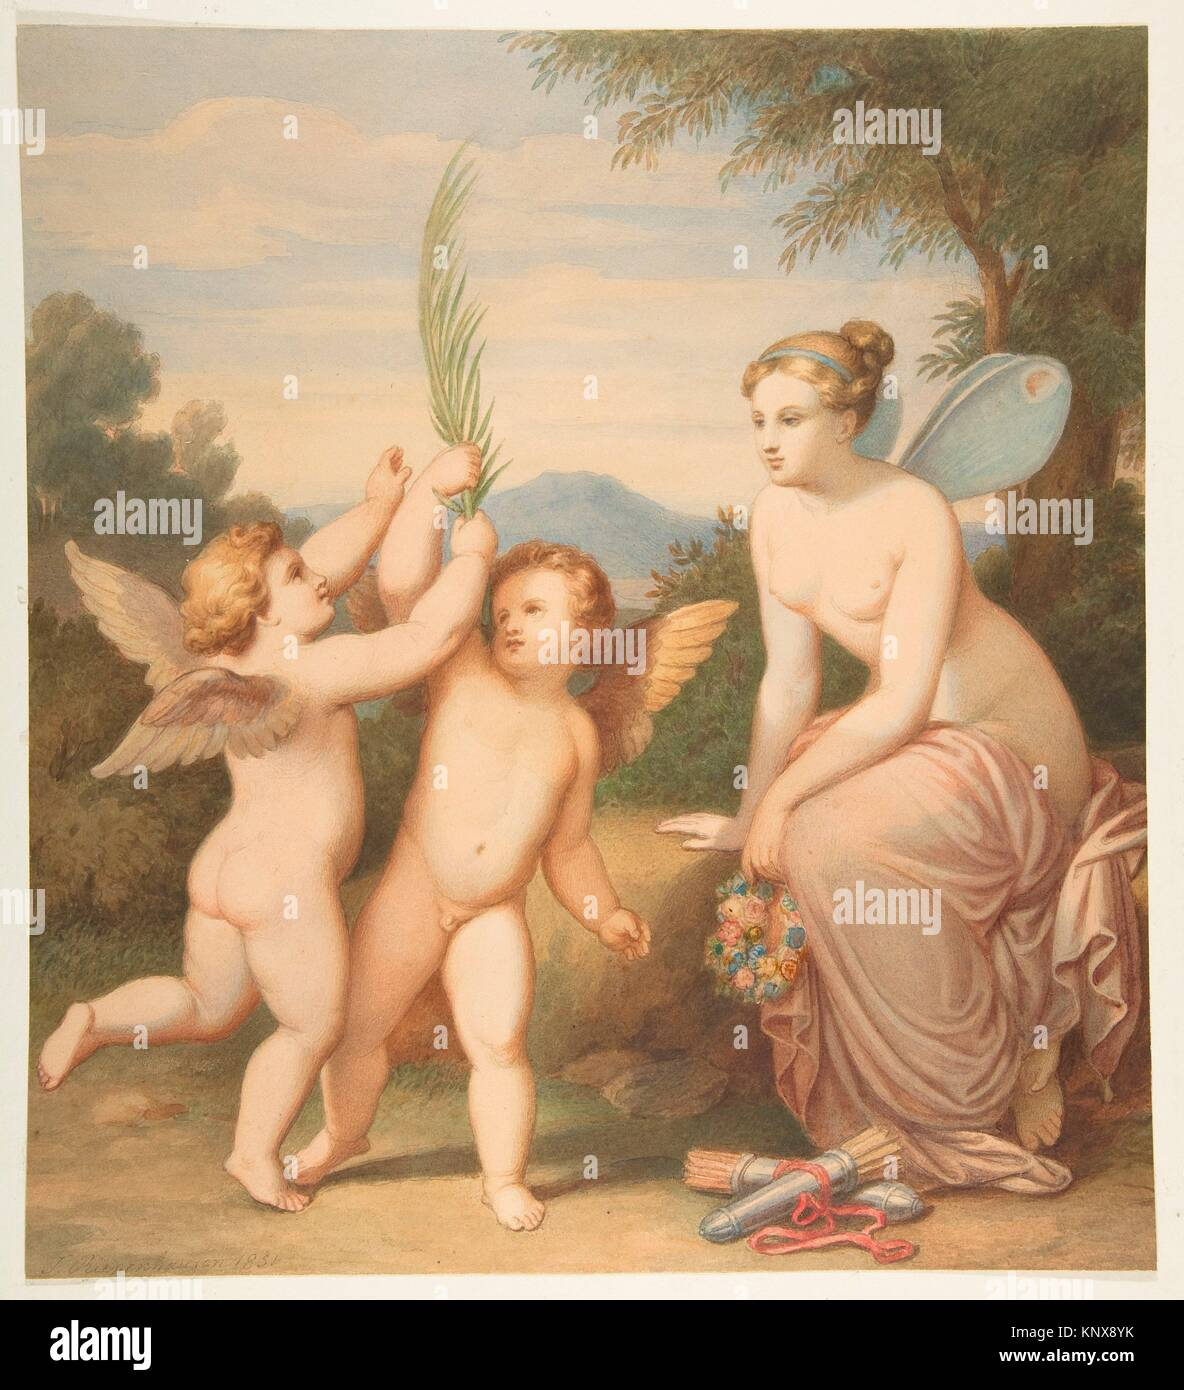 Eros and Anteros with Psyche Looking at Them. Artist: Johannes Riepenhausen (German, Goettingen 1788-1860 Venice); - Stock Image